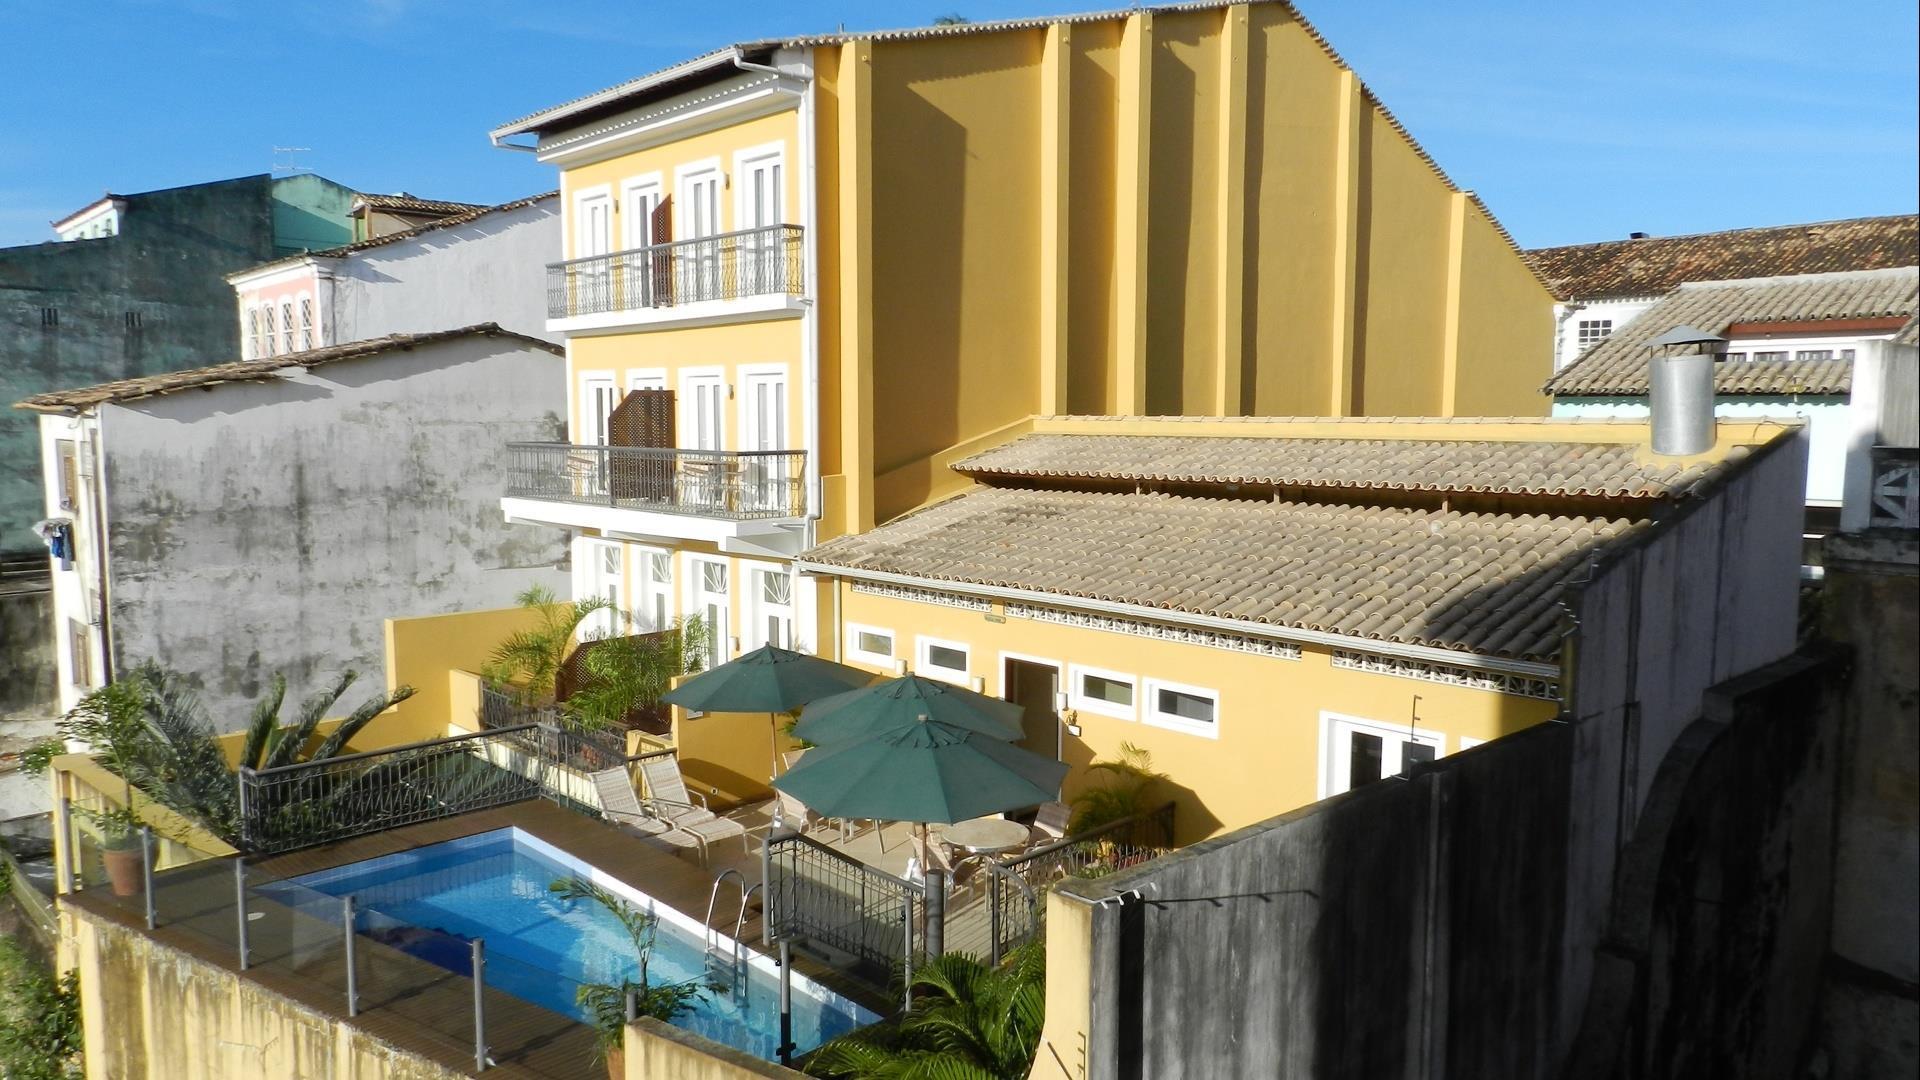 Brasilien Salvador: Superior Hotel - Hotel Casa do Amarelindo